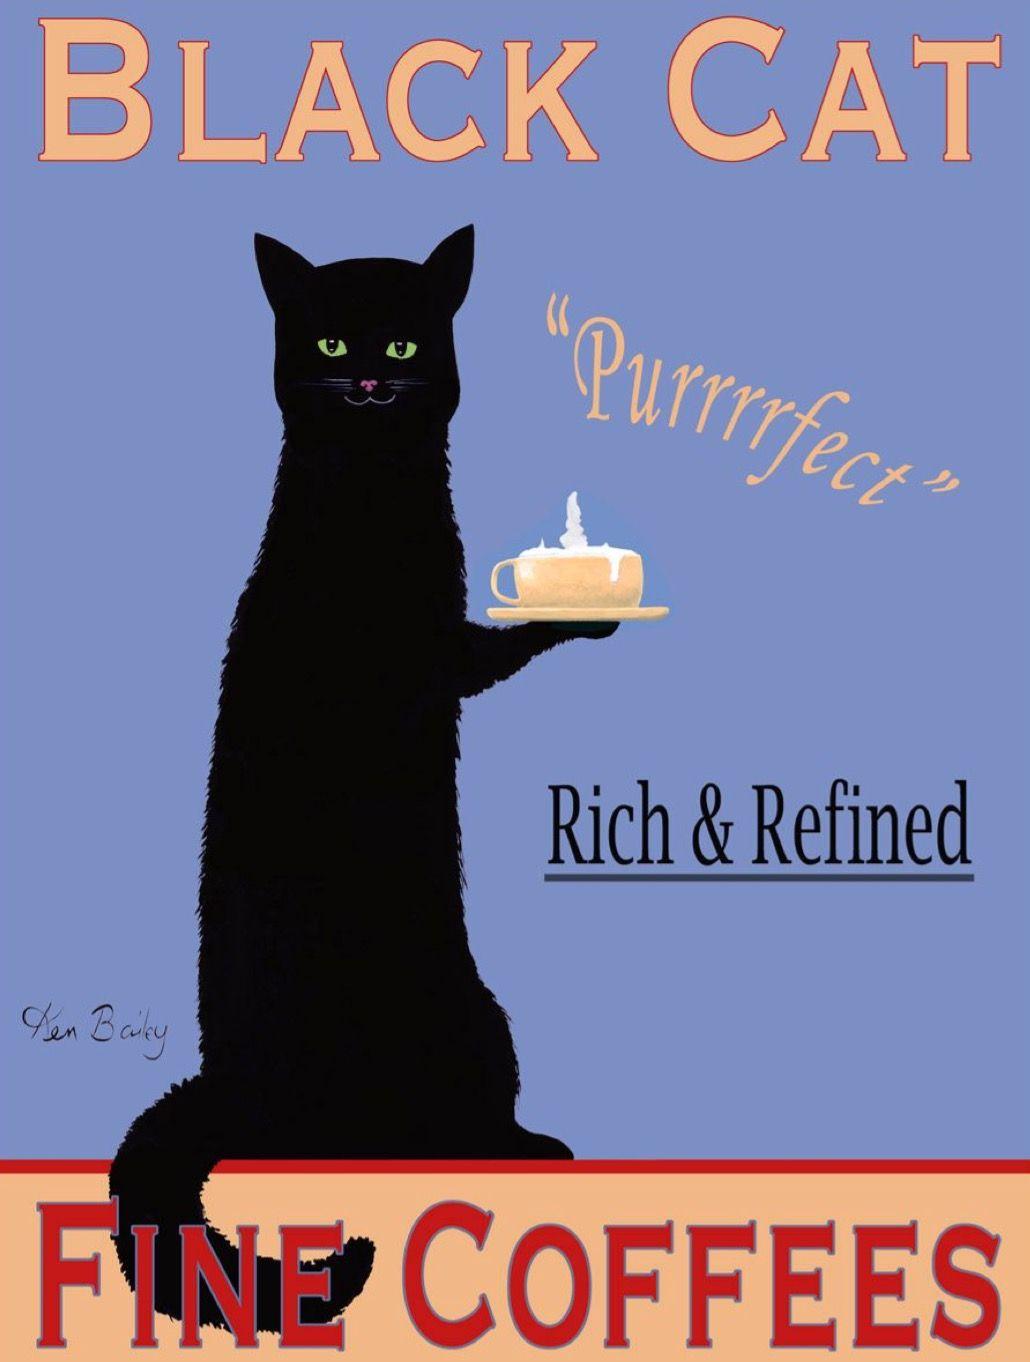 Black Cat Fine Coffees Plakaty Vintage Plakat Akwarele Sztuka